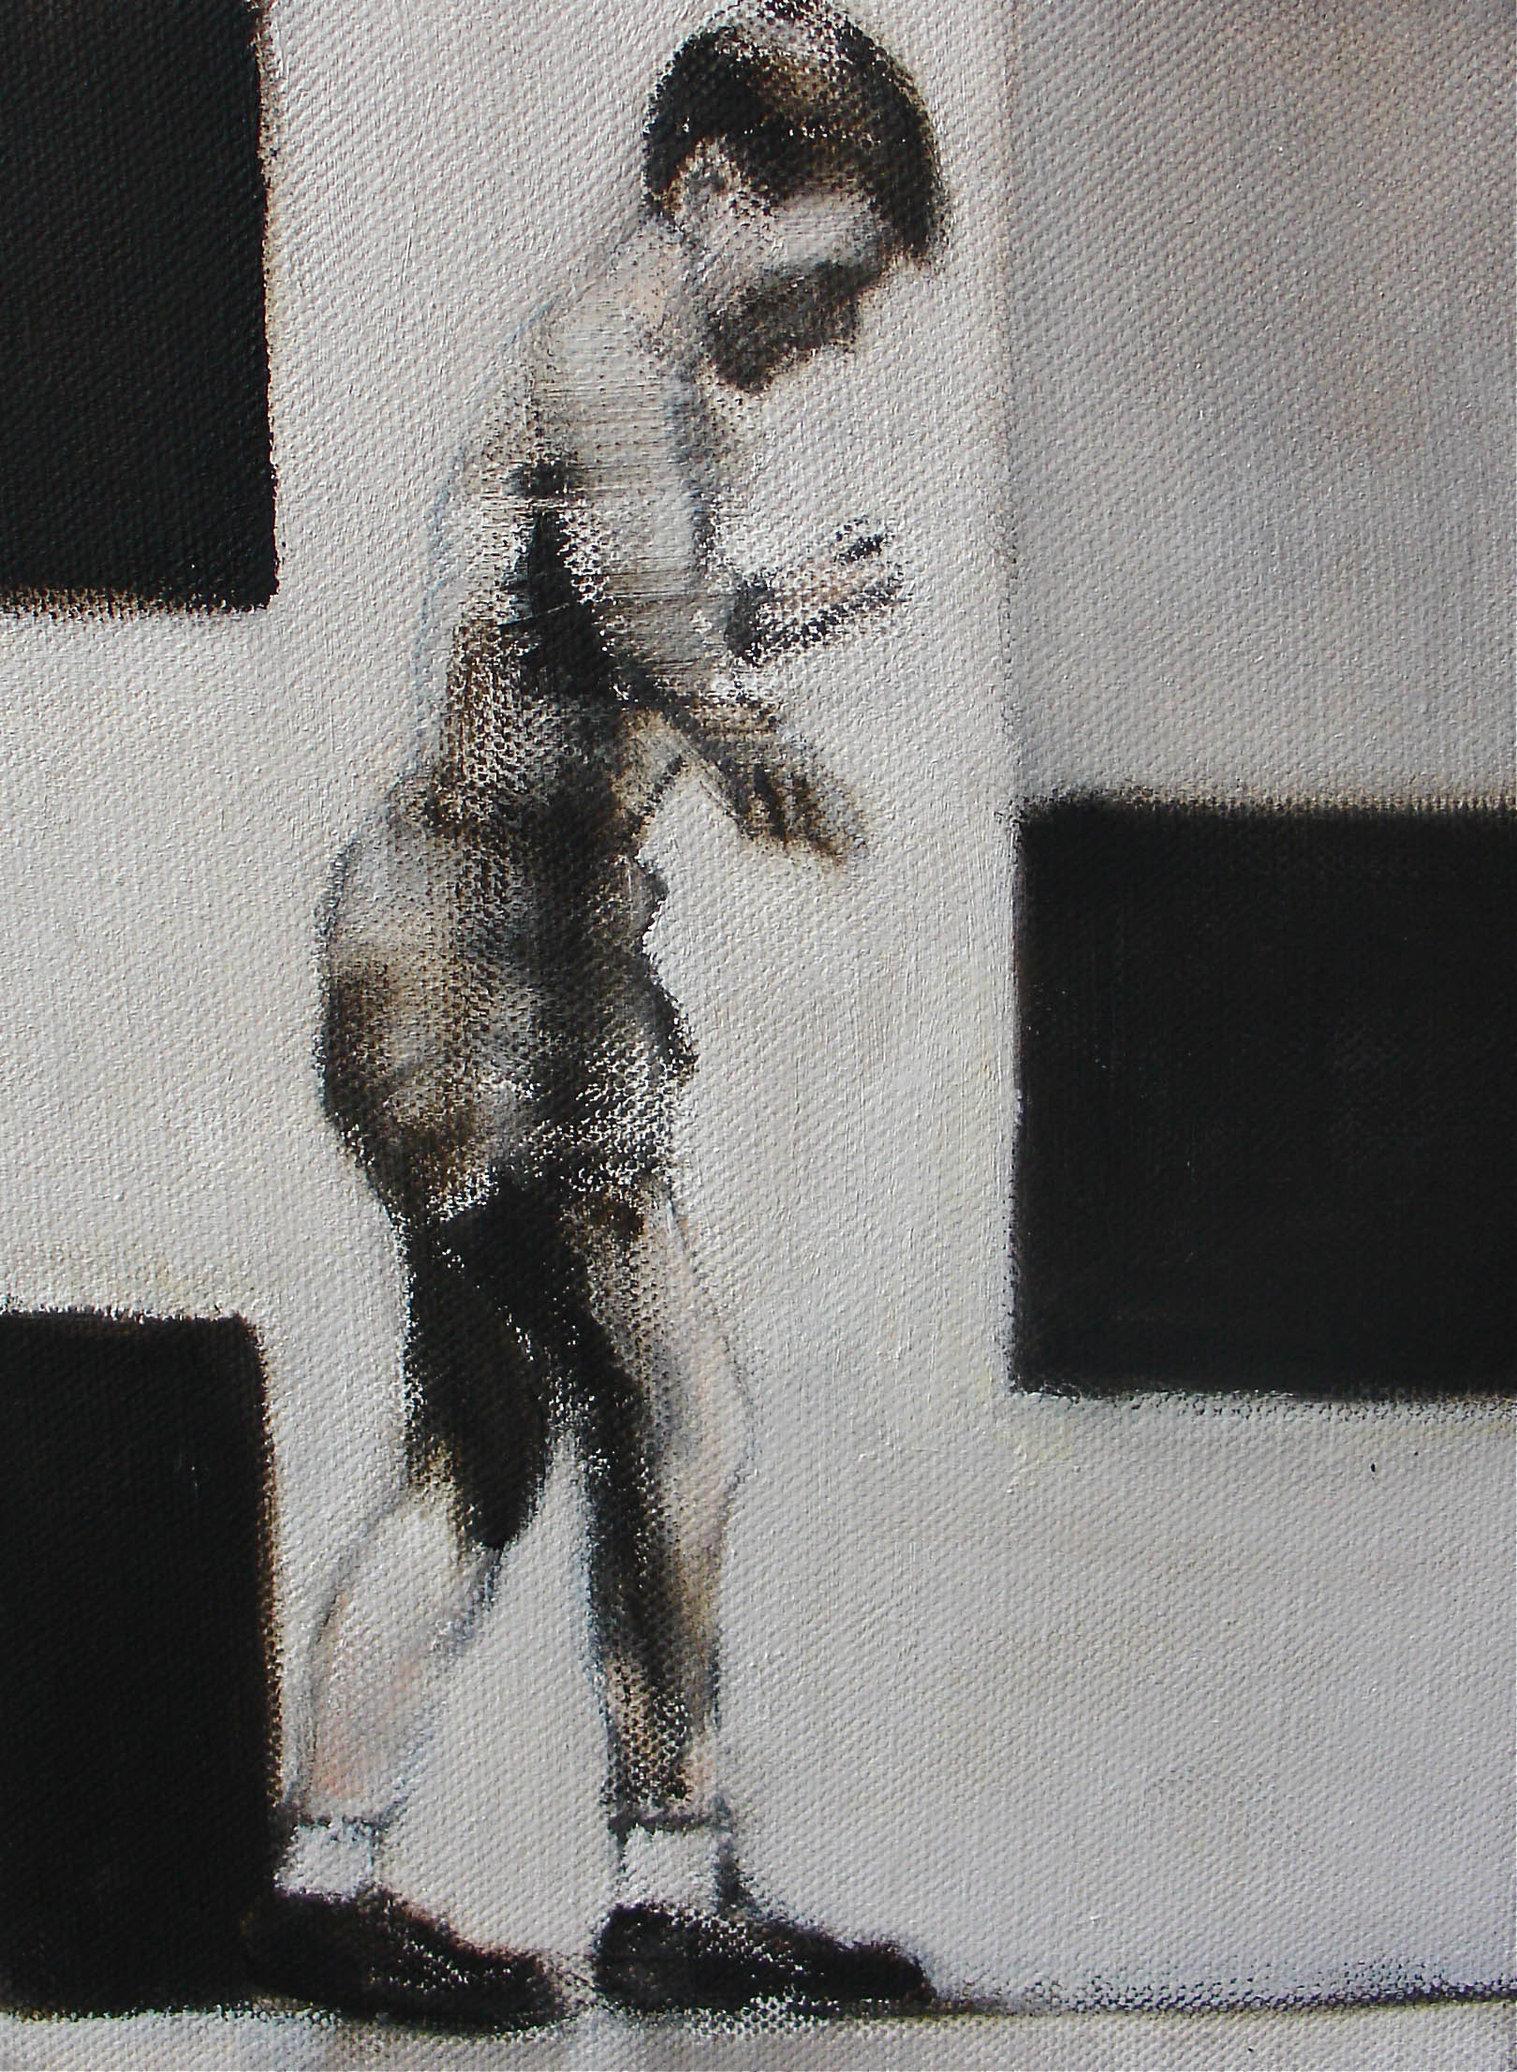 Johannes van Vugt, Untitled, 2014